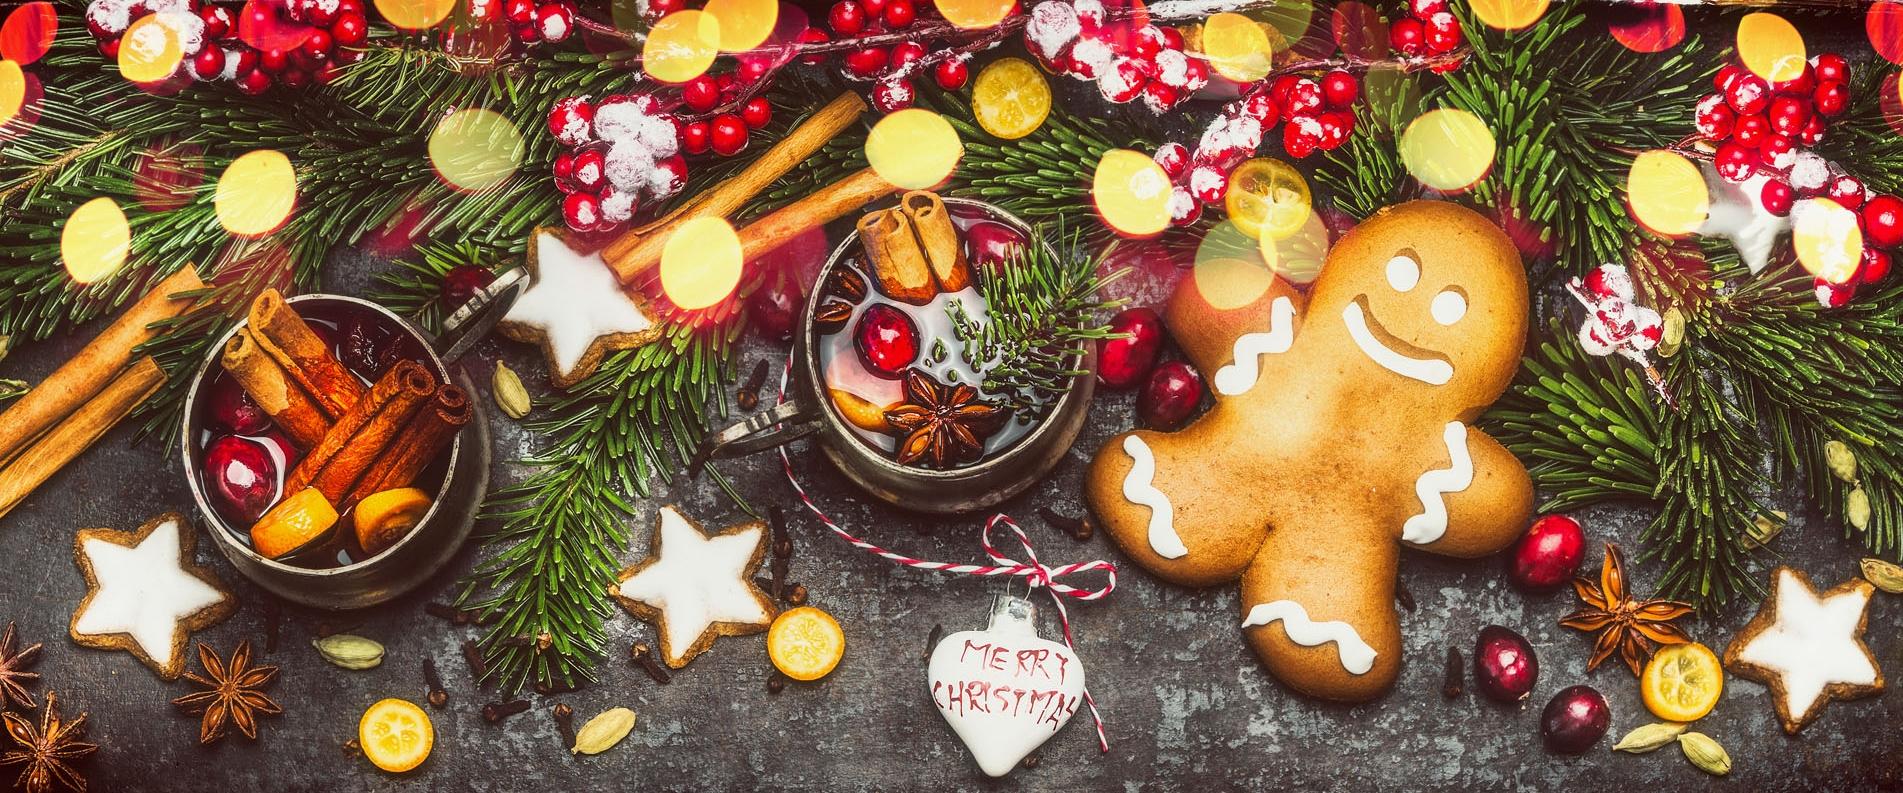 Chasing Christmas spirit in Cyprus